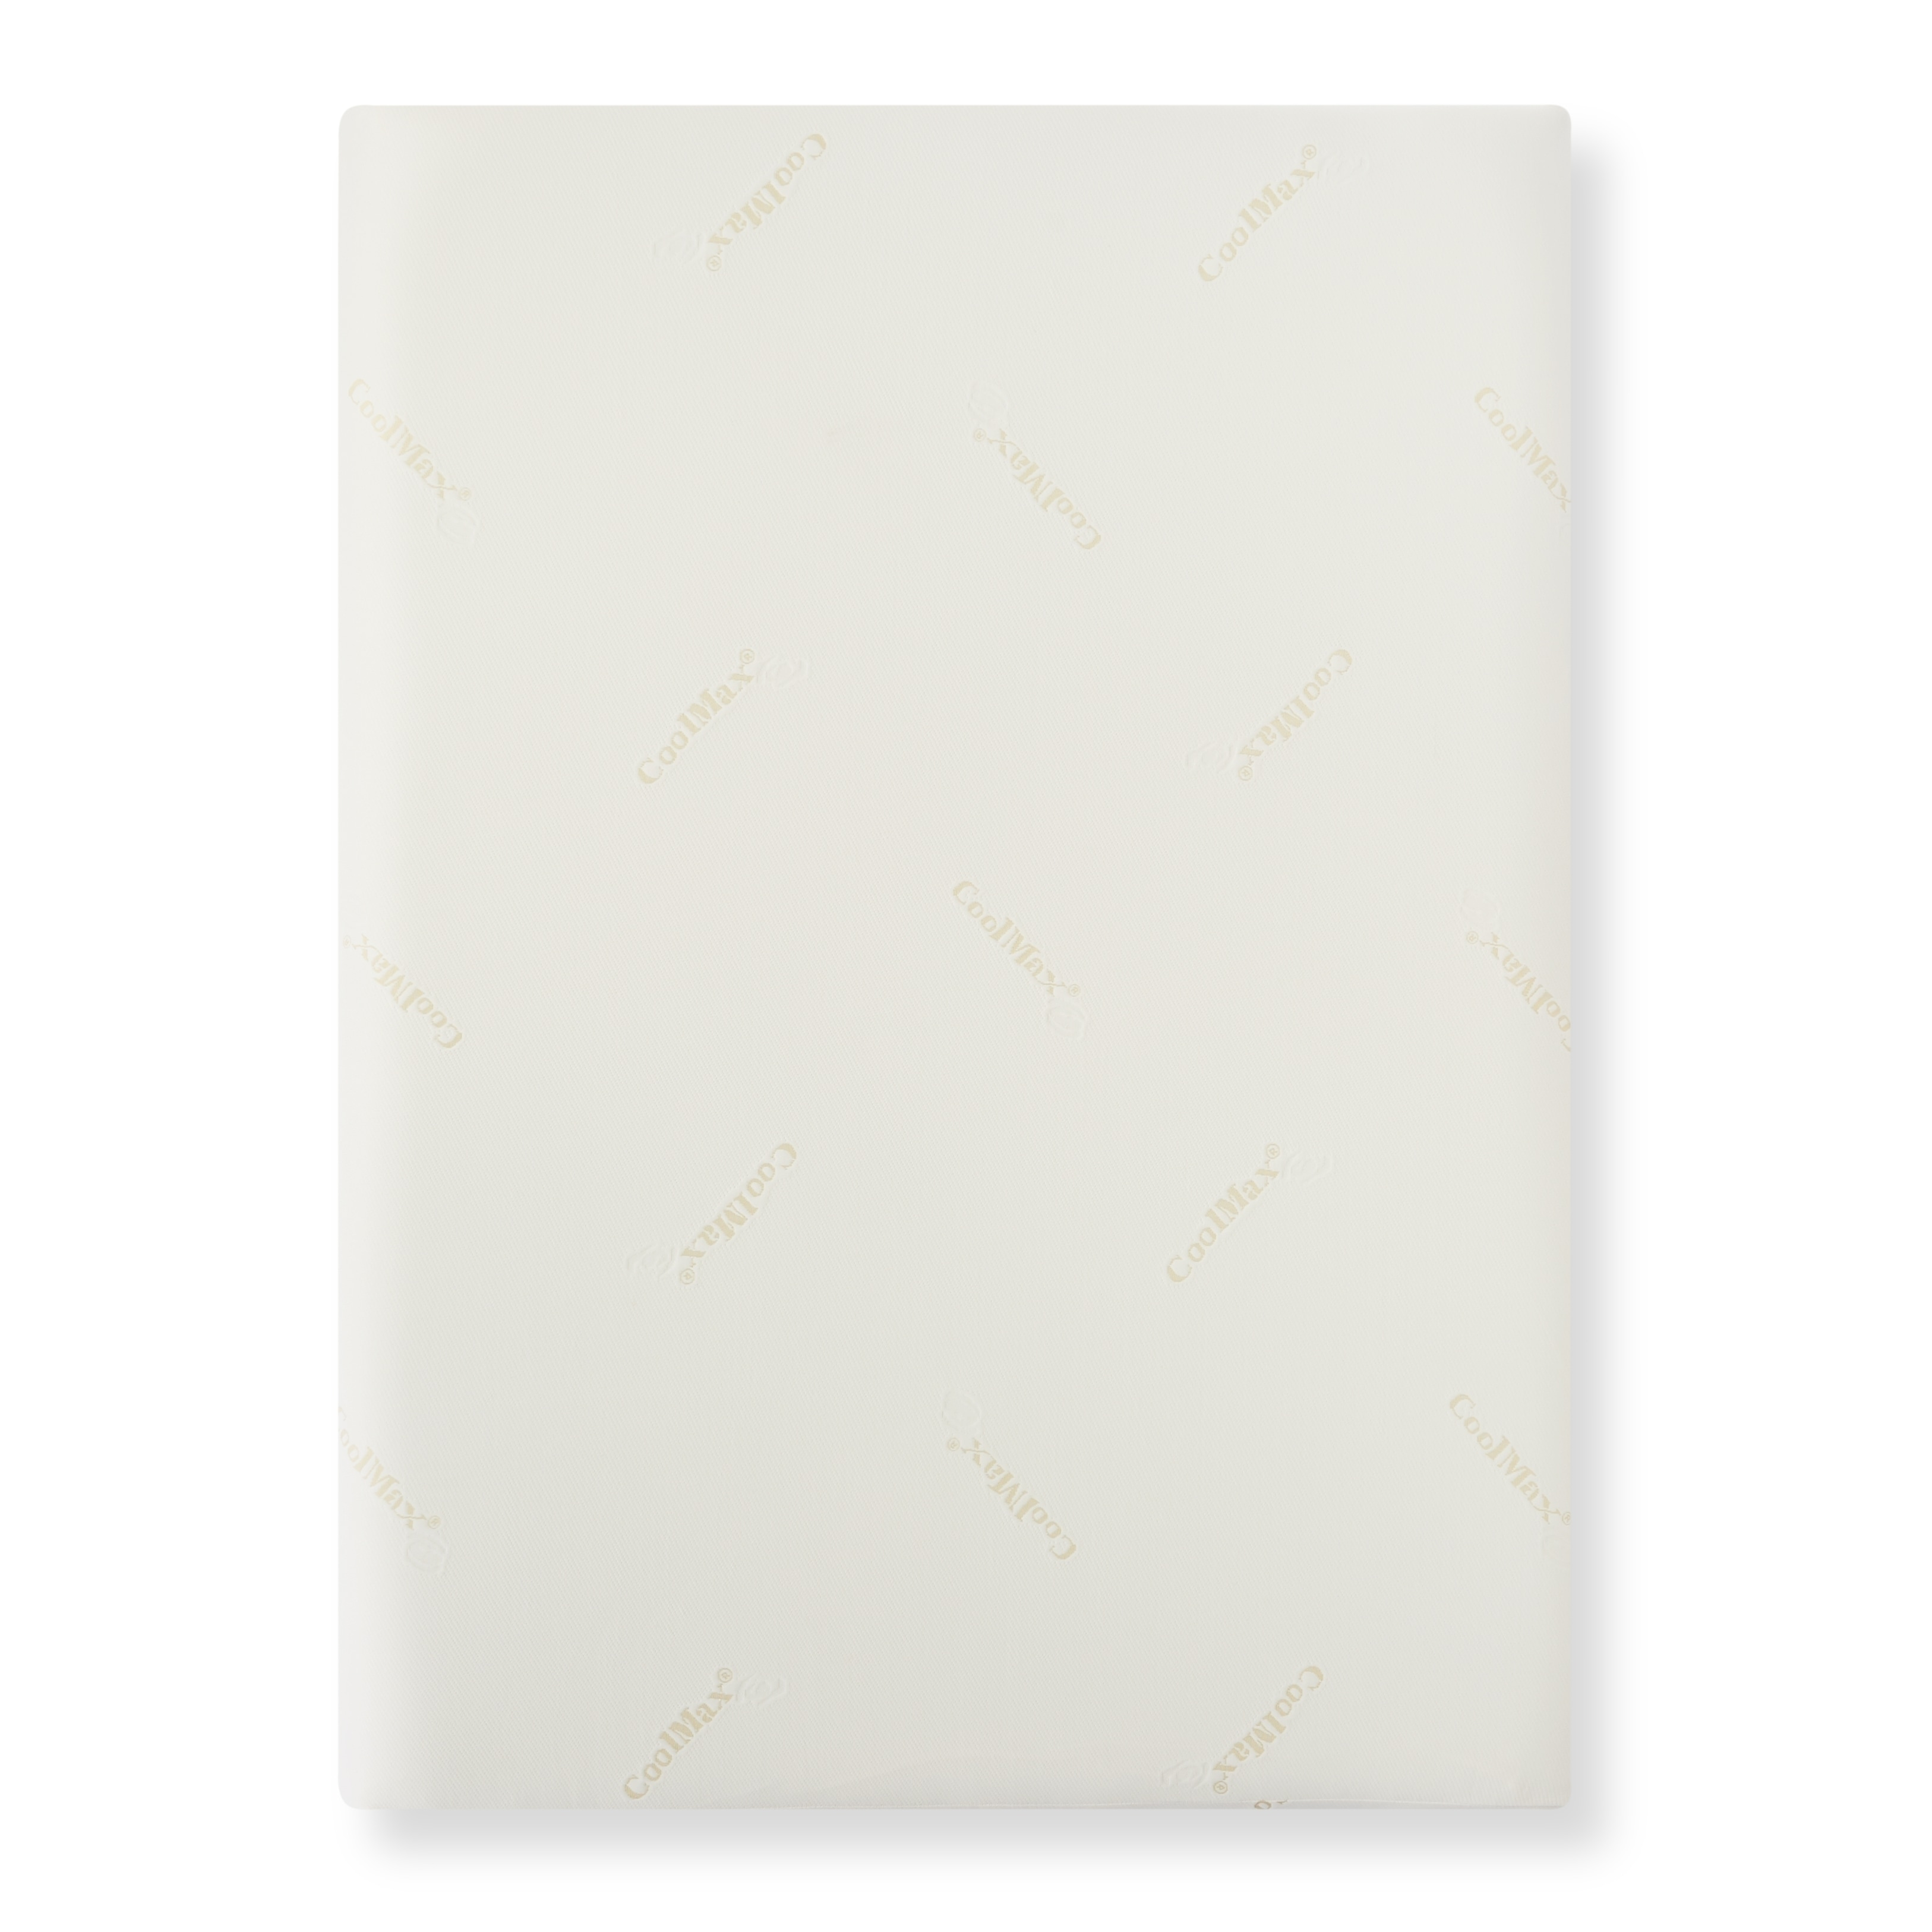 comfort dreams coolmax 10 inch full size memory foam mattress free